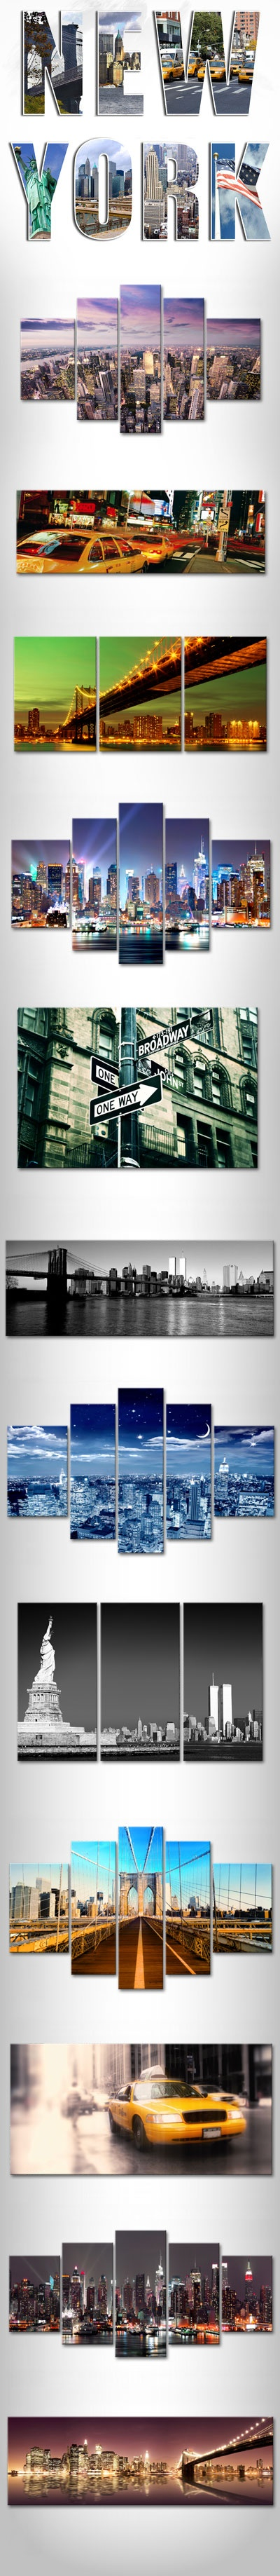 NY Canvas Art by bimago (www.bimago.com)